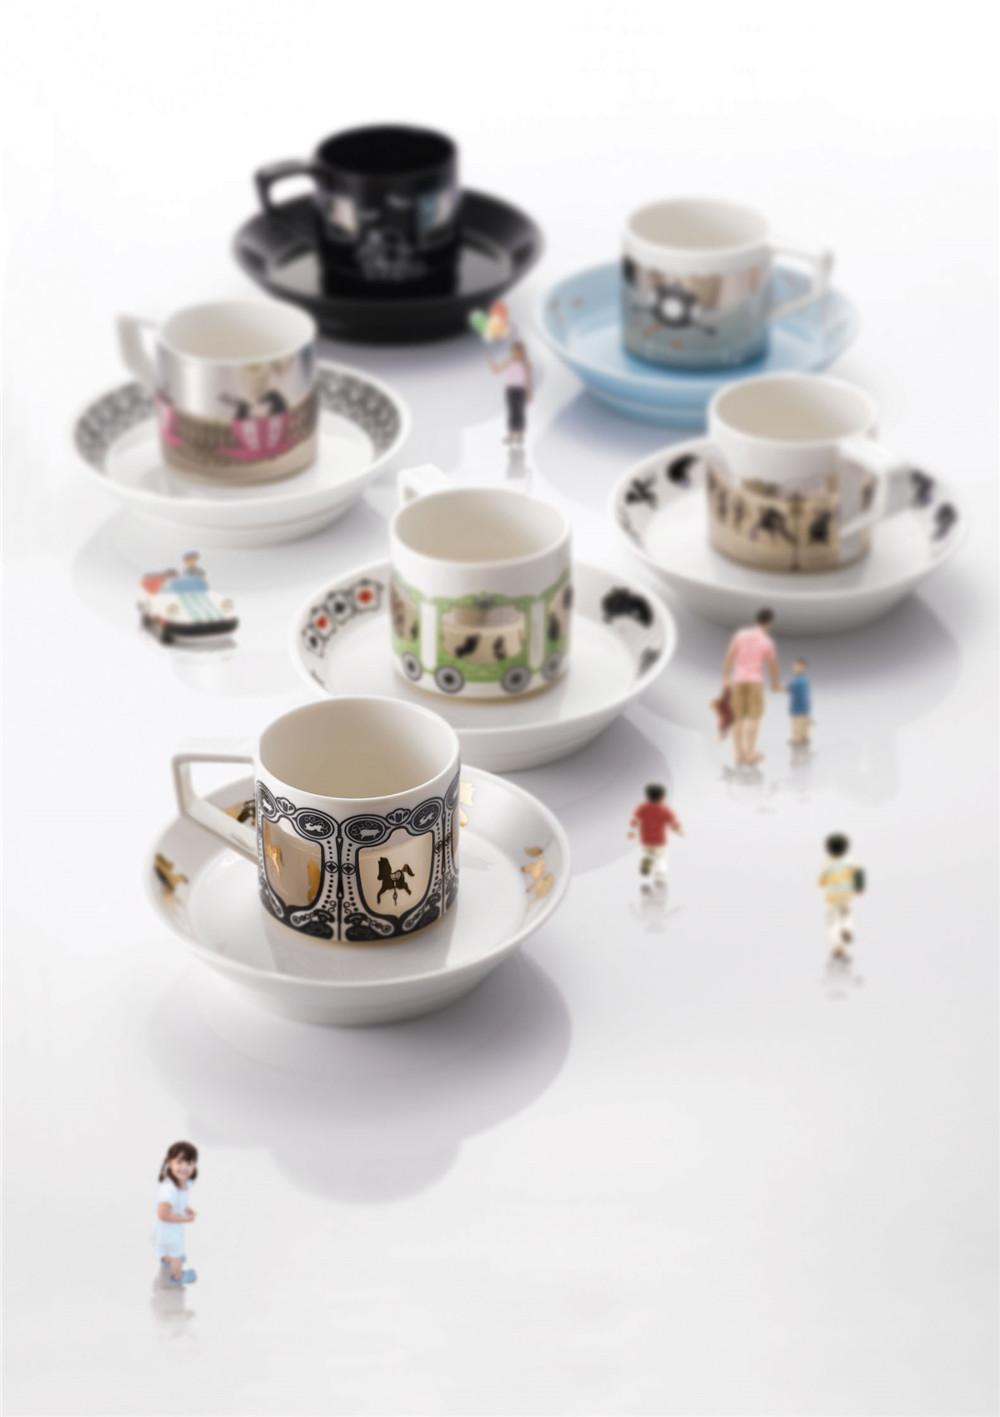 round-round-land-caffee-cup-hisheji (4)